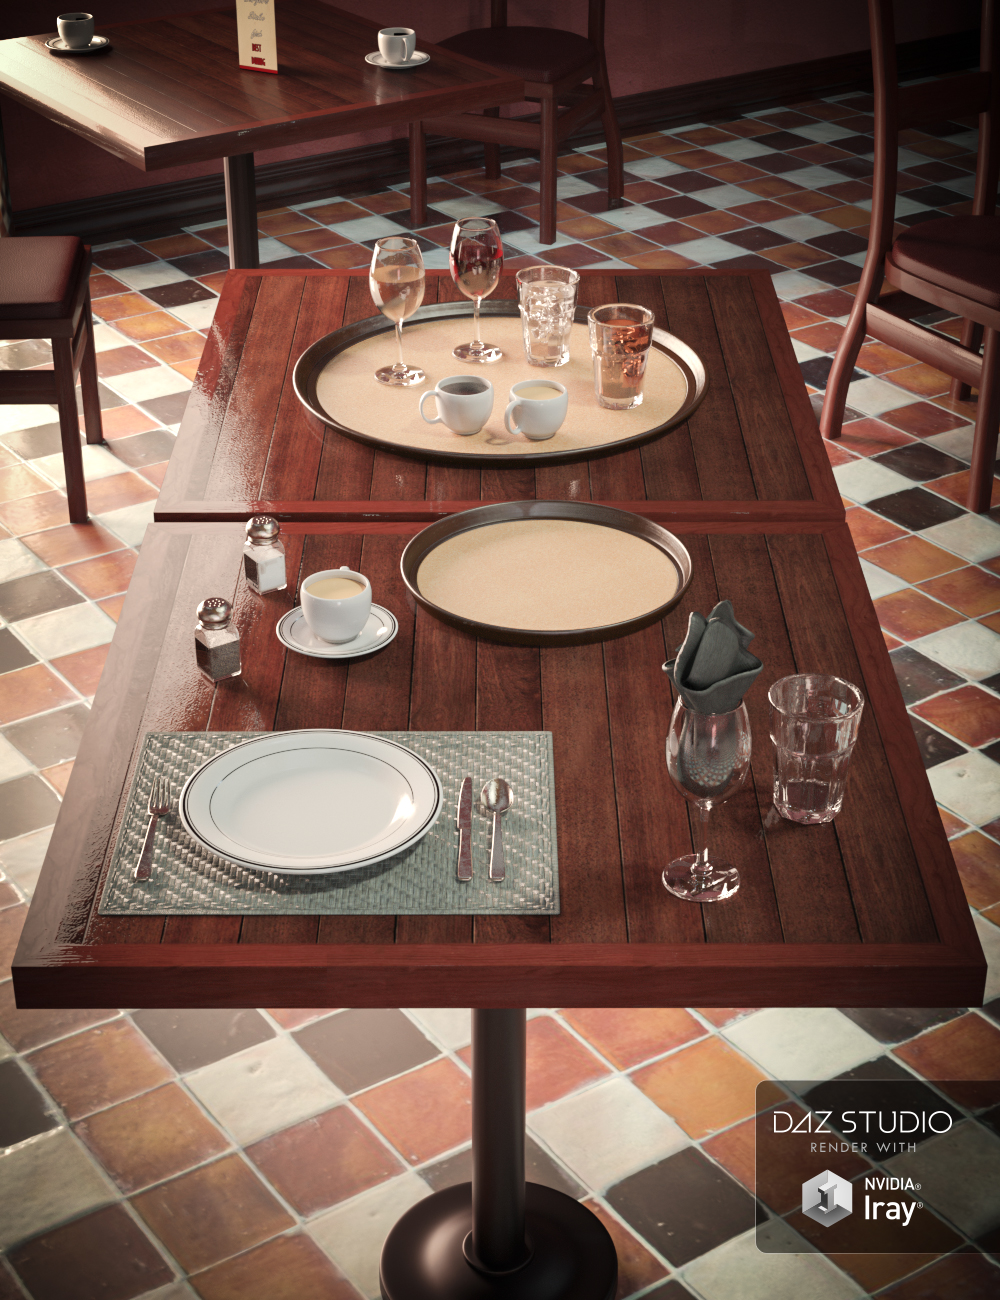 Restaurant Props by: SloshWerks, 3D Models by Daz 3D